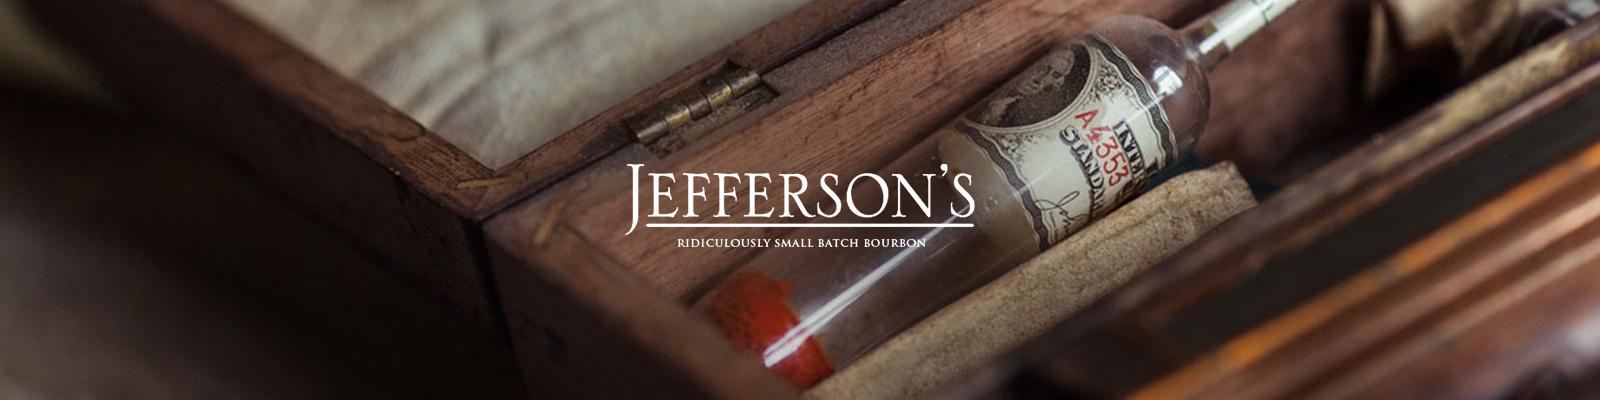 Jefferson's Whiskey